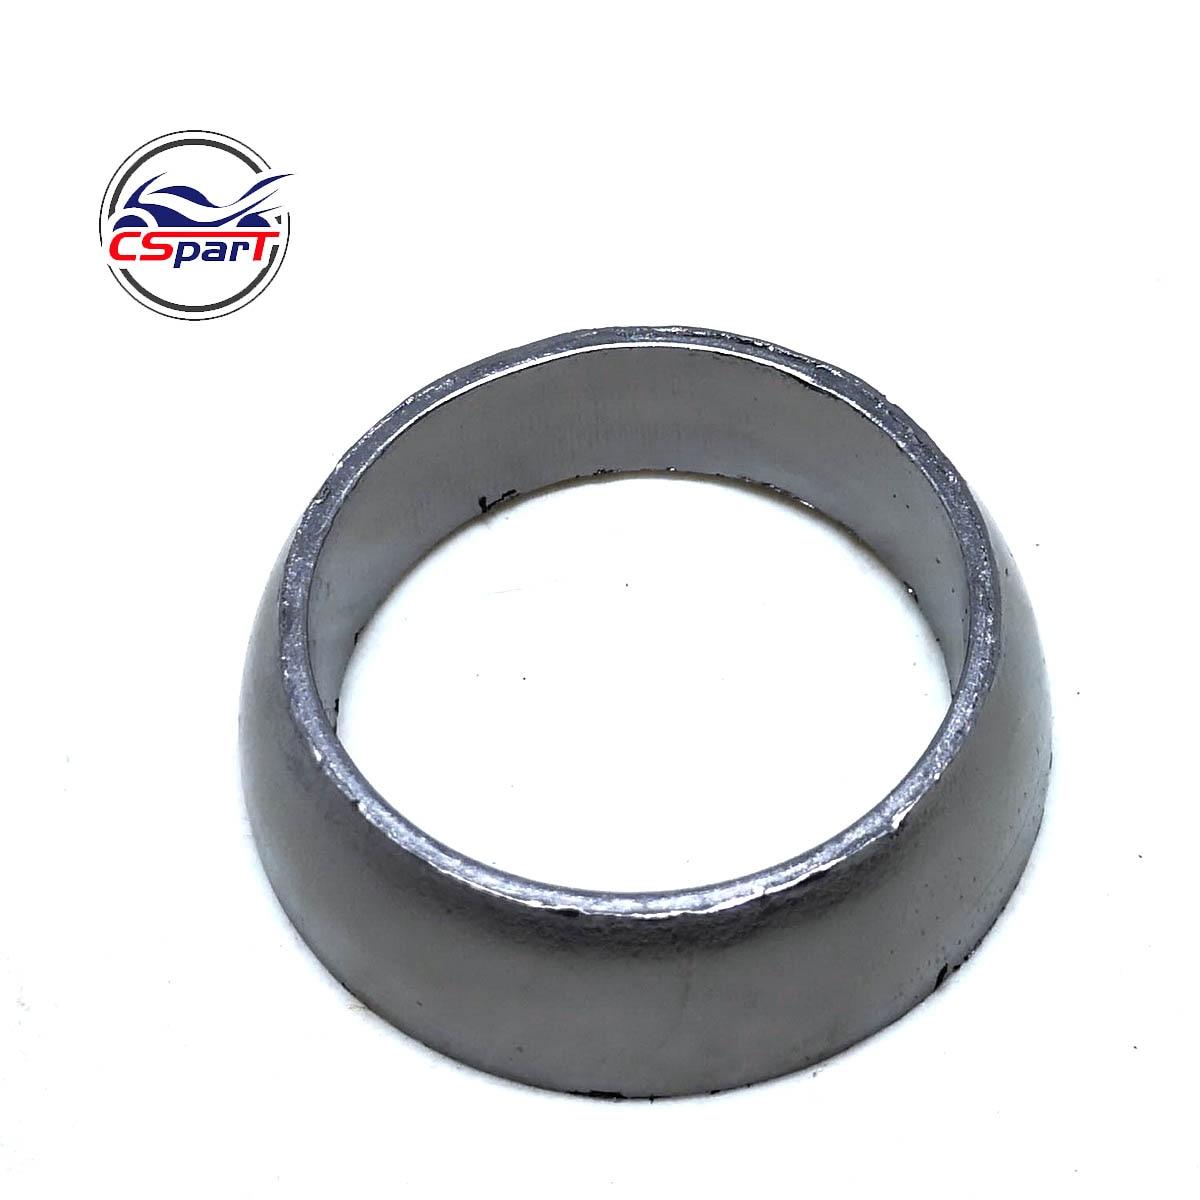 Exhaust Gasket Donut Seal For Polaris Ranger Sportsman 400 500 5256385 5243518 5242571